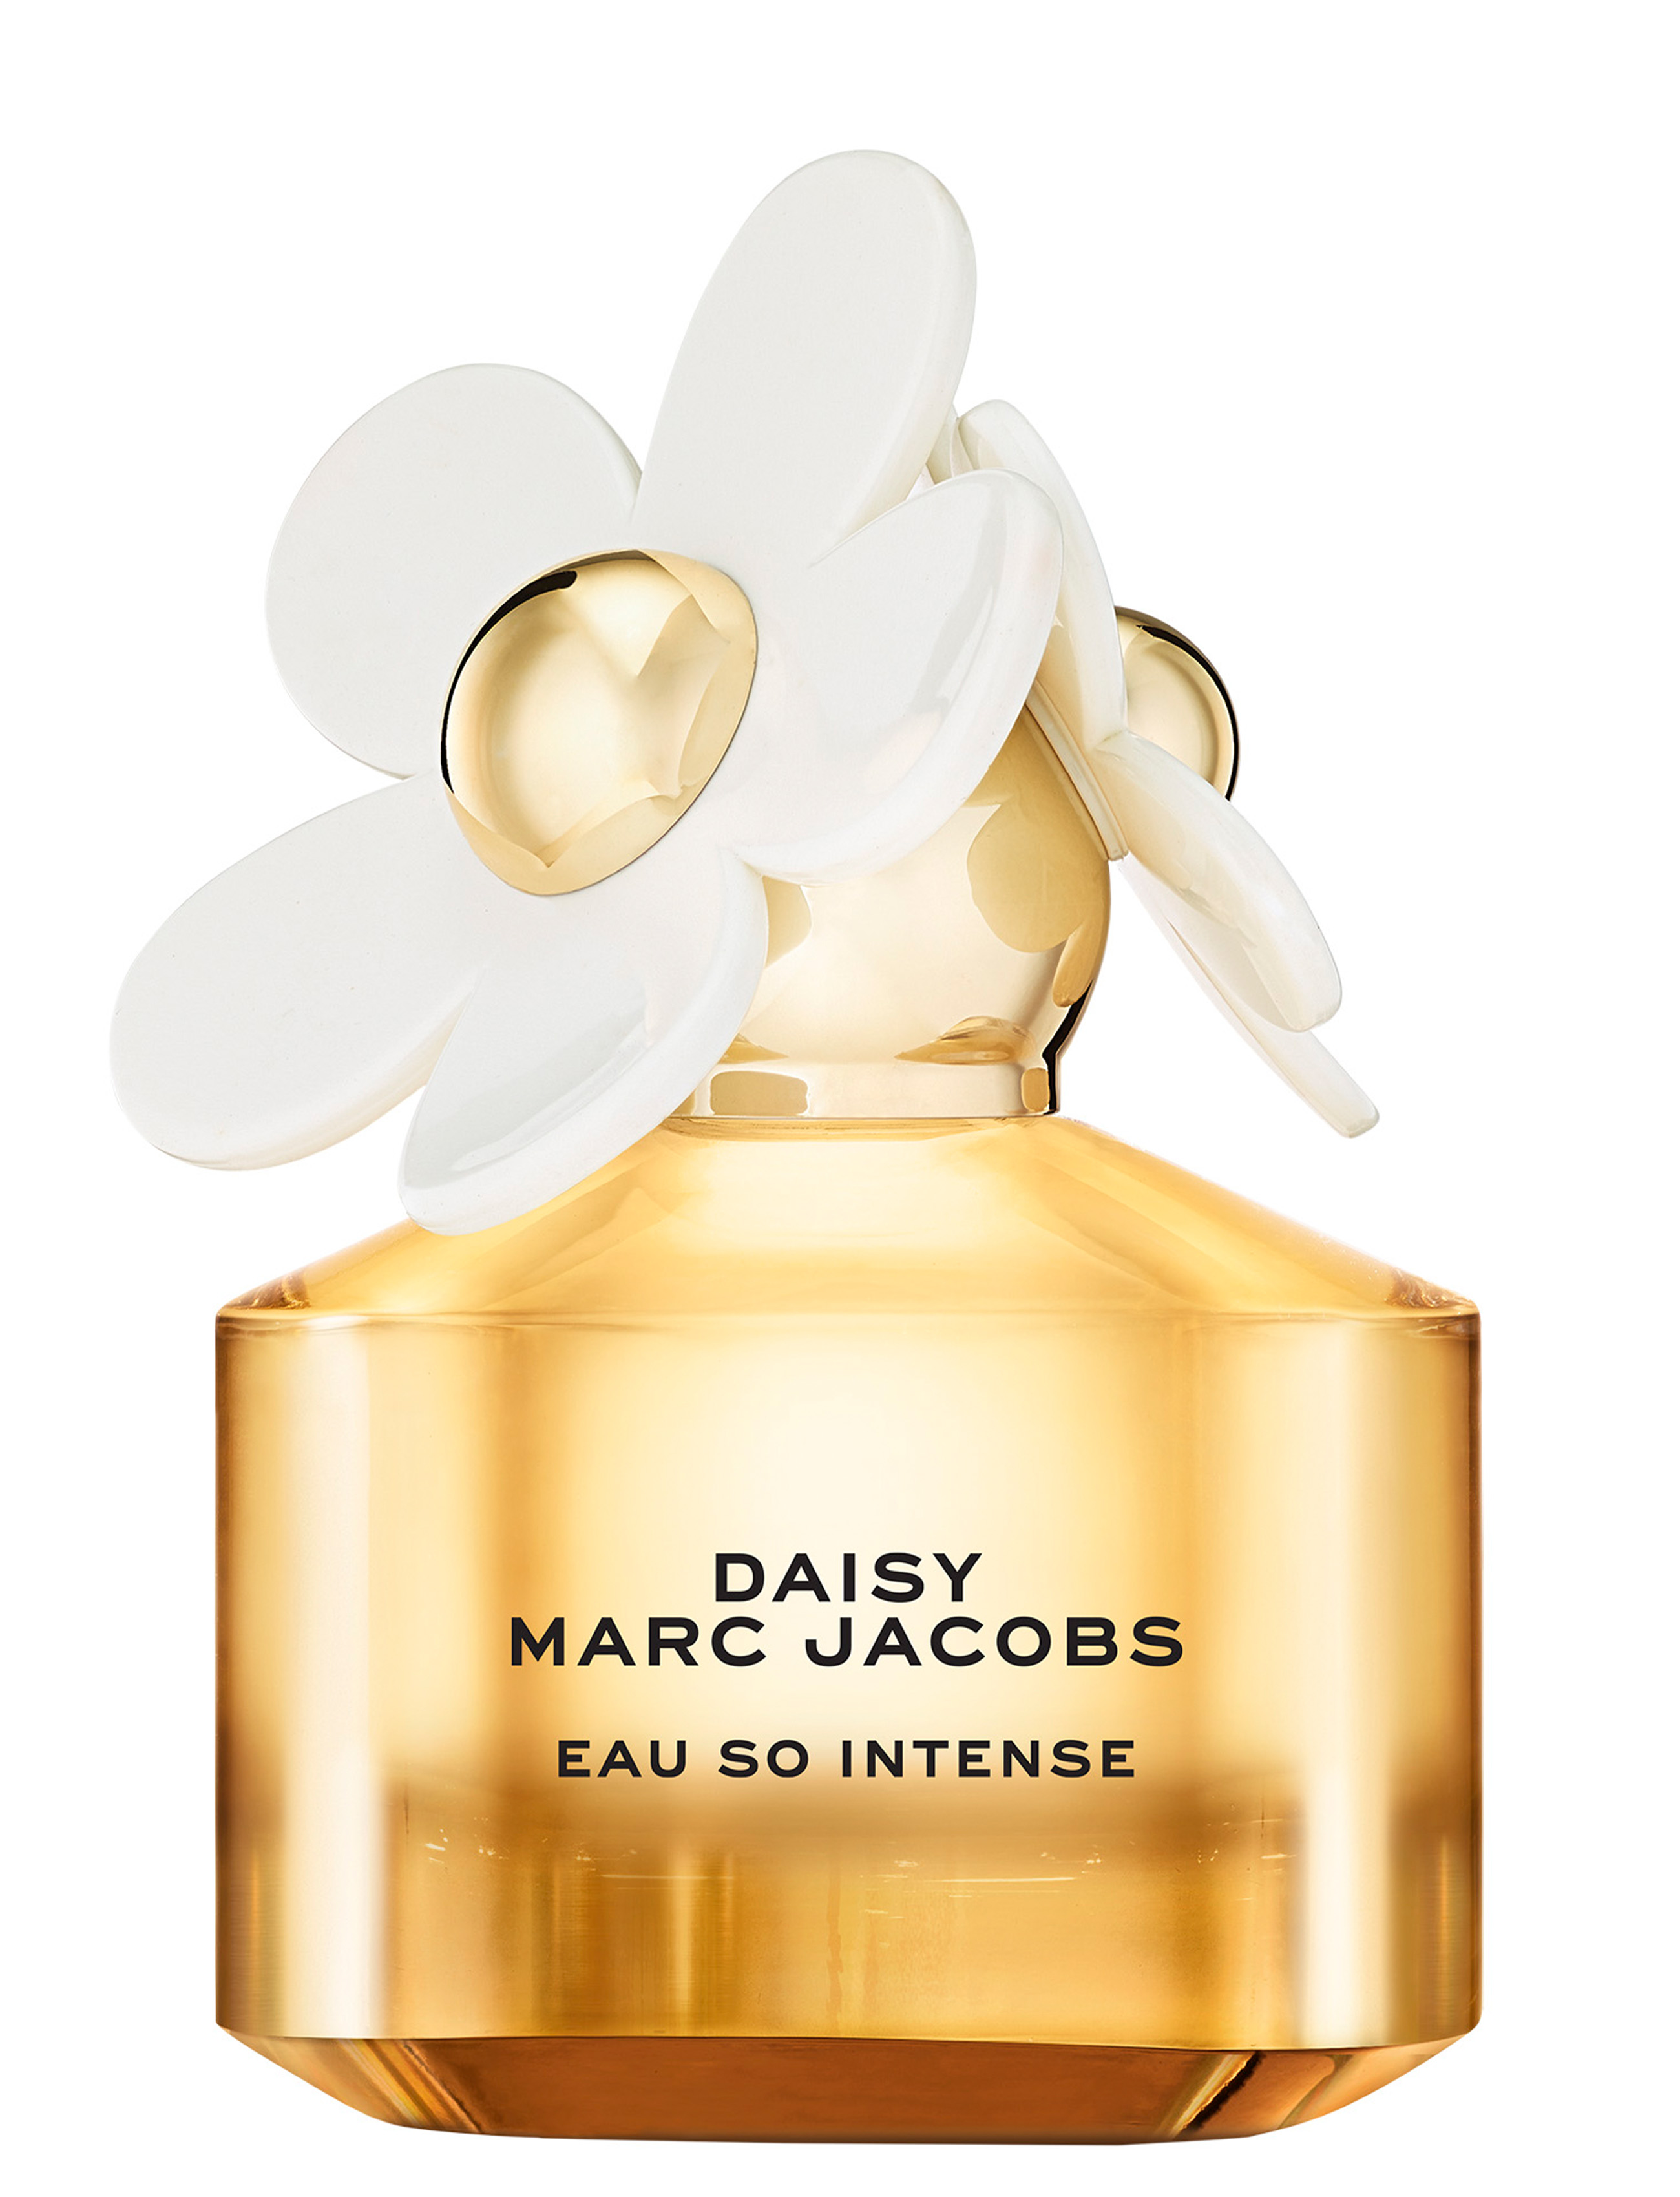 Marc Jacobs Daisy Eau So Intense EDP, 50 ml